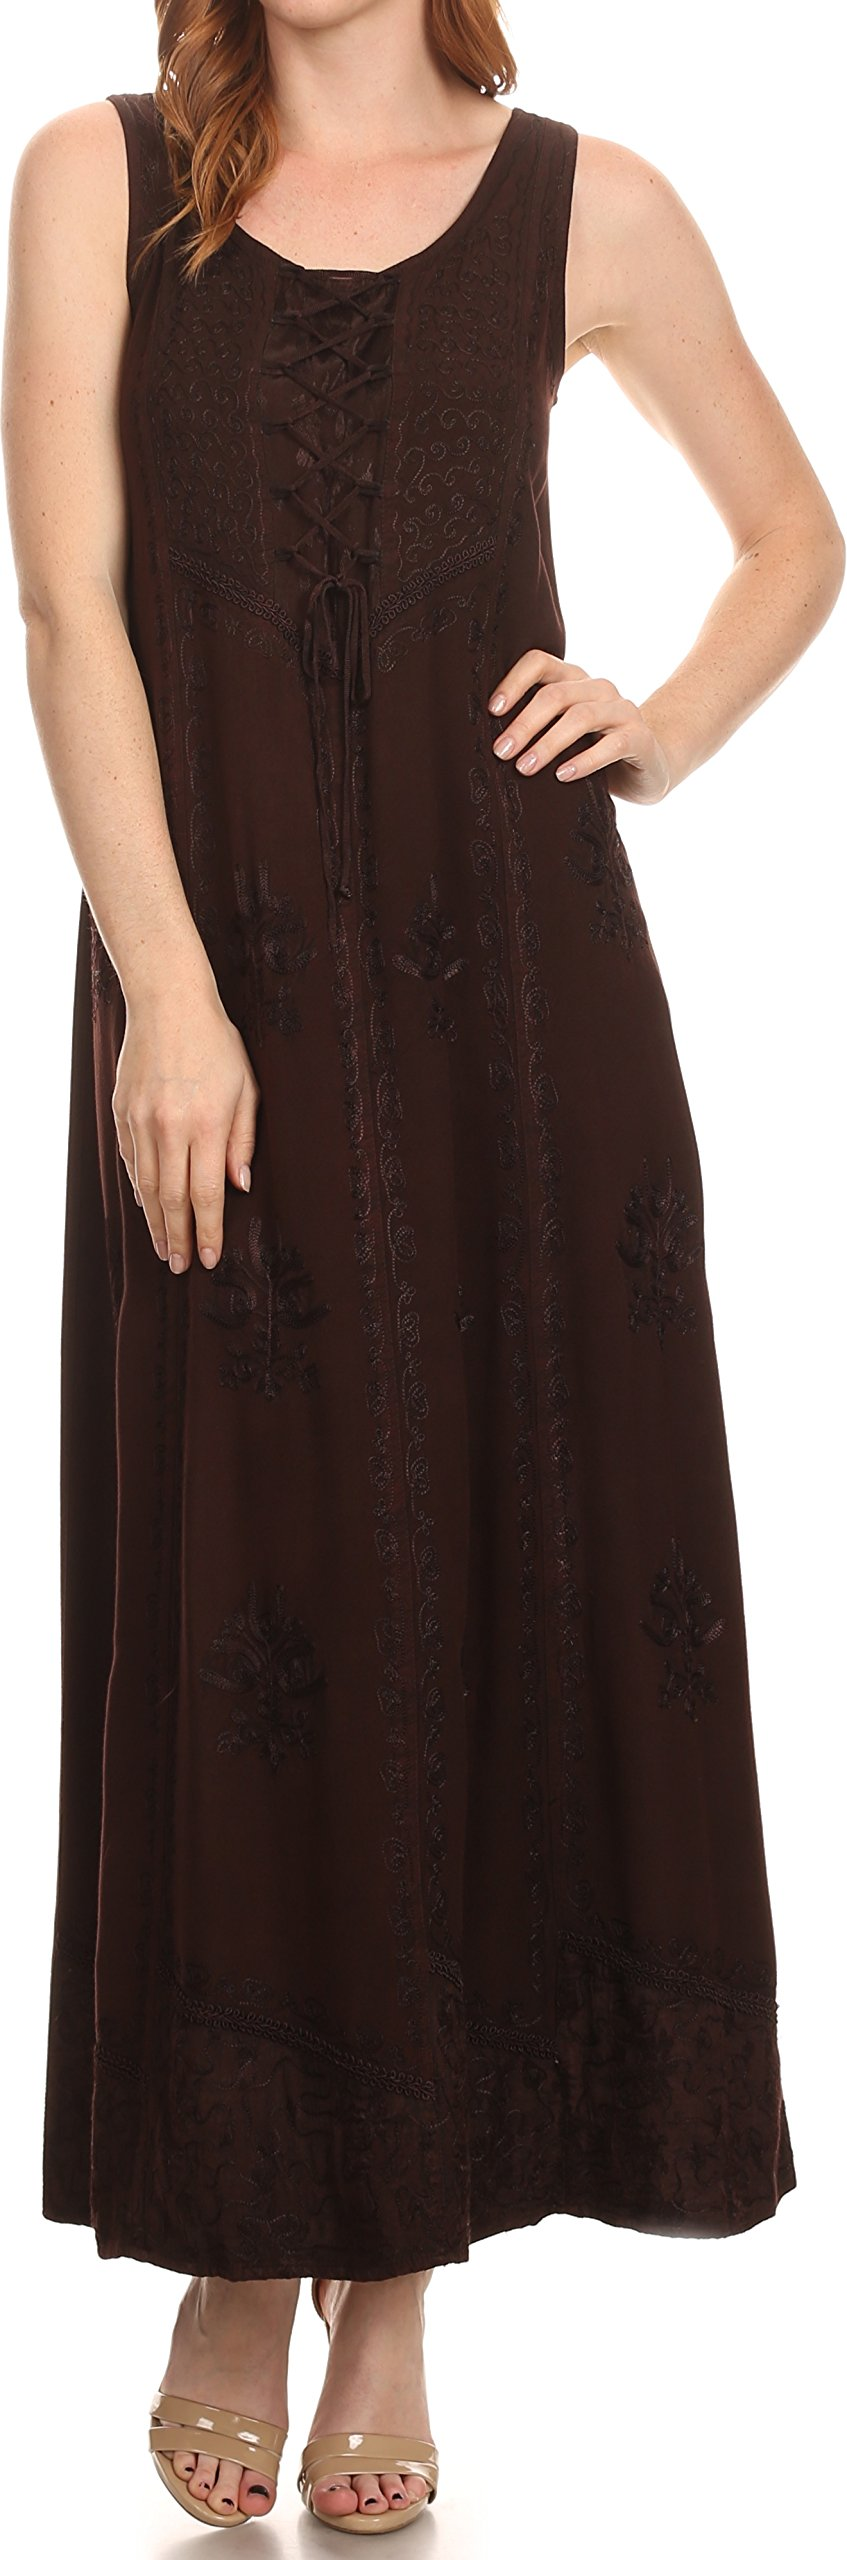 Sakkas 15229 - Stella Long Tank Top Adjustable Caftan Corset Dress With Embroidery - chocolate - 1X/2X